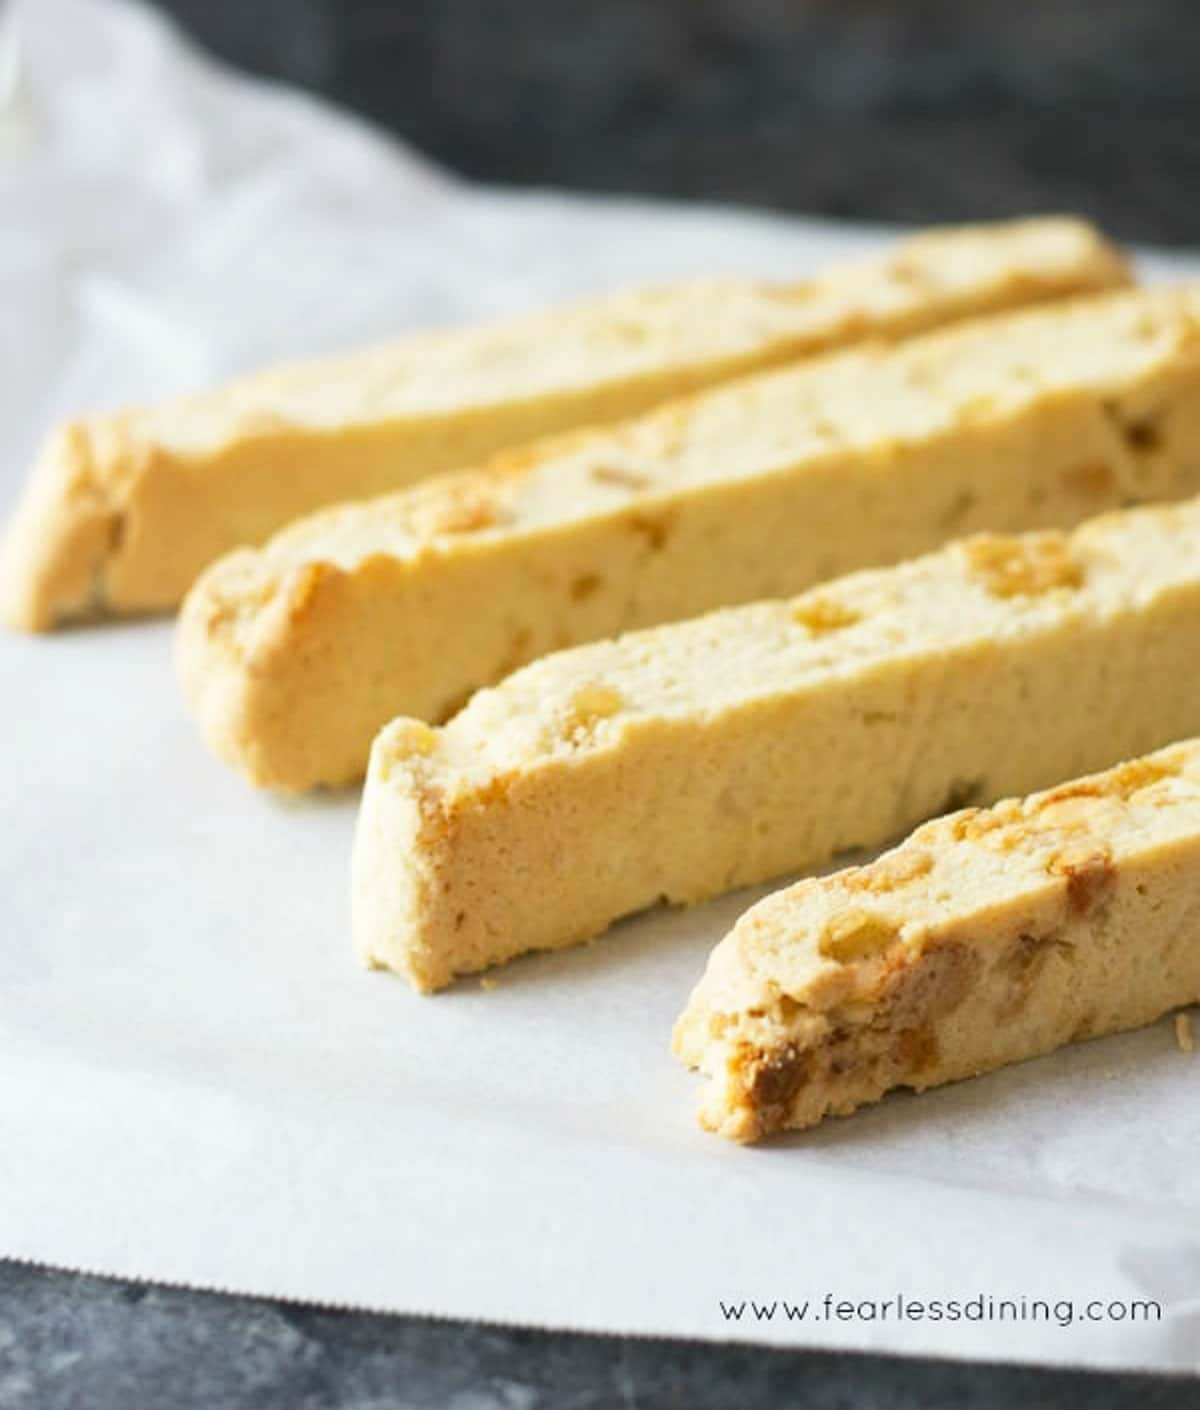 ginger biscotti on a baking sheet